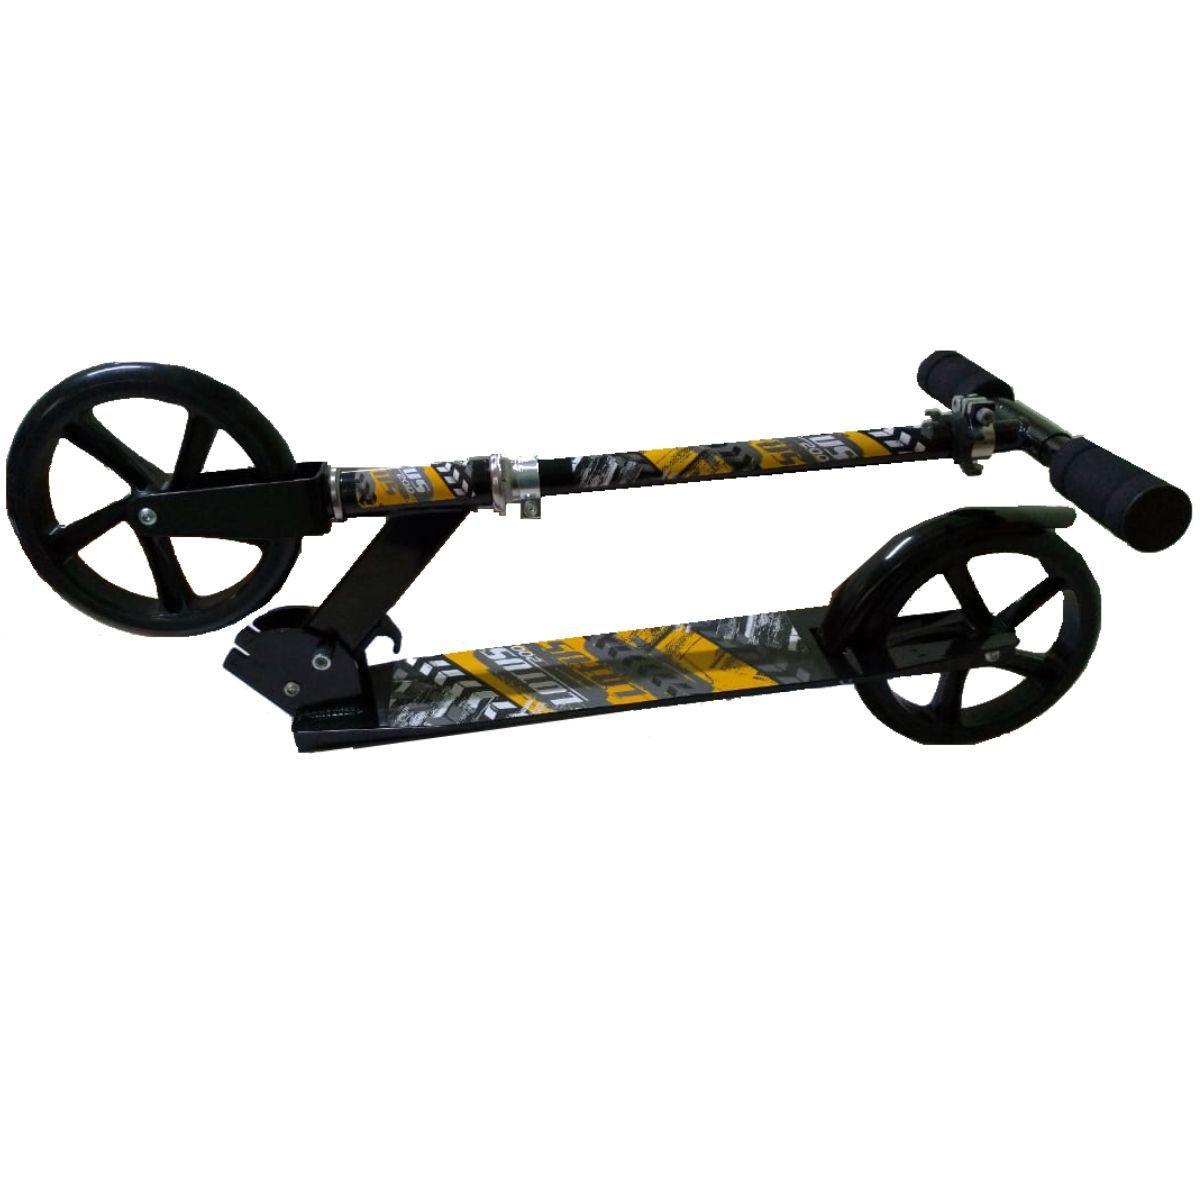 Kit 3x Patinete Adulto e Infantil Roda 20cm - YTA-663